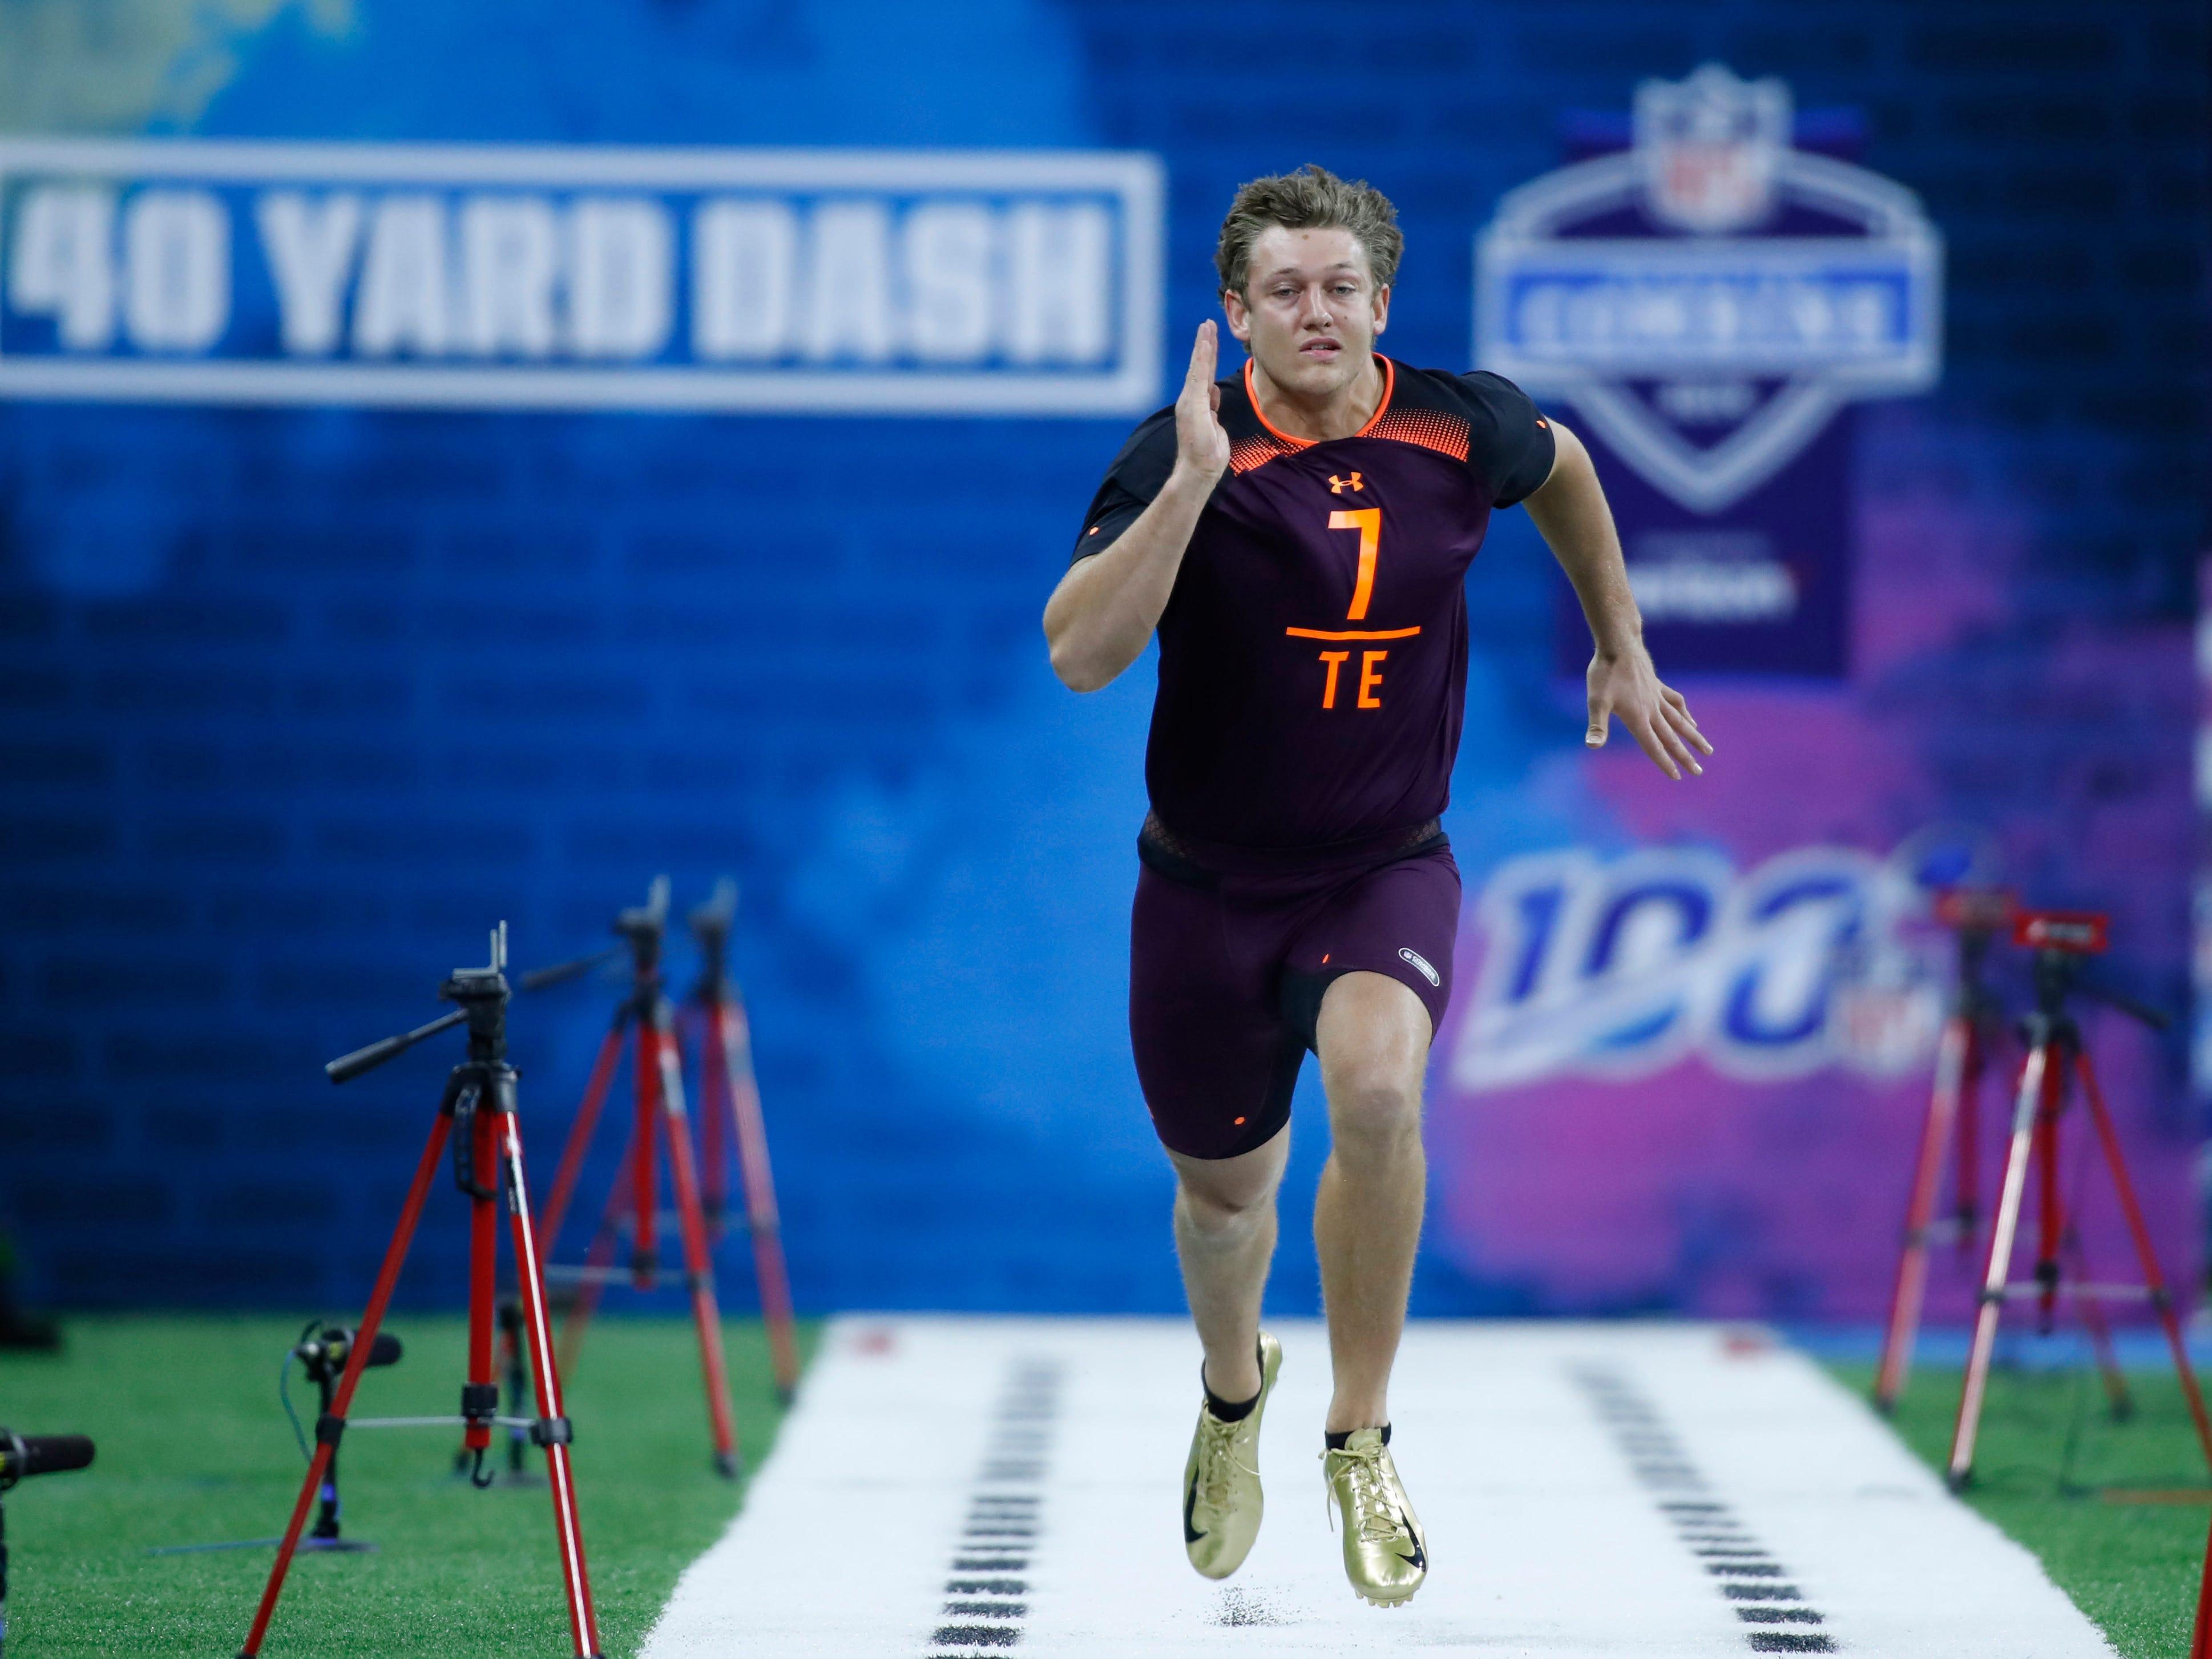 Iowa tight end T J Hockenson runs the 40 yard dash during the 2019 NFL Combine at Lucas Oil Stadium.